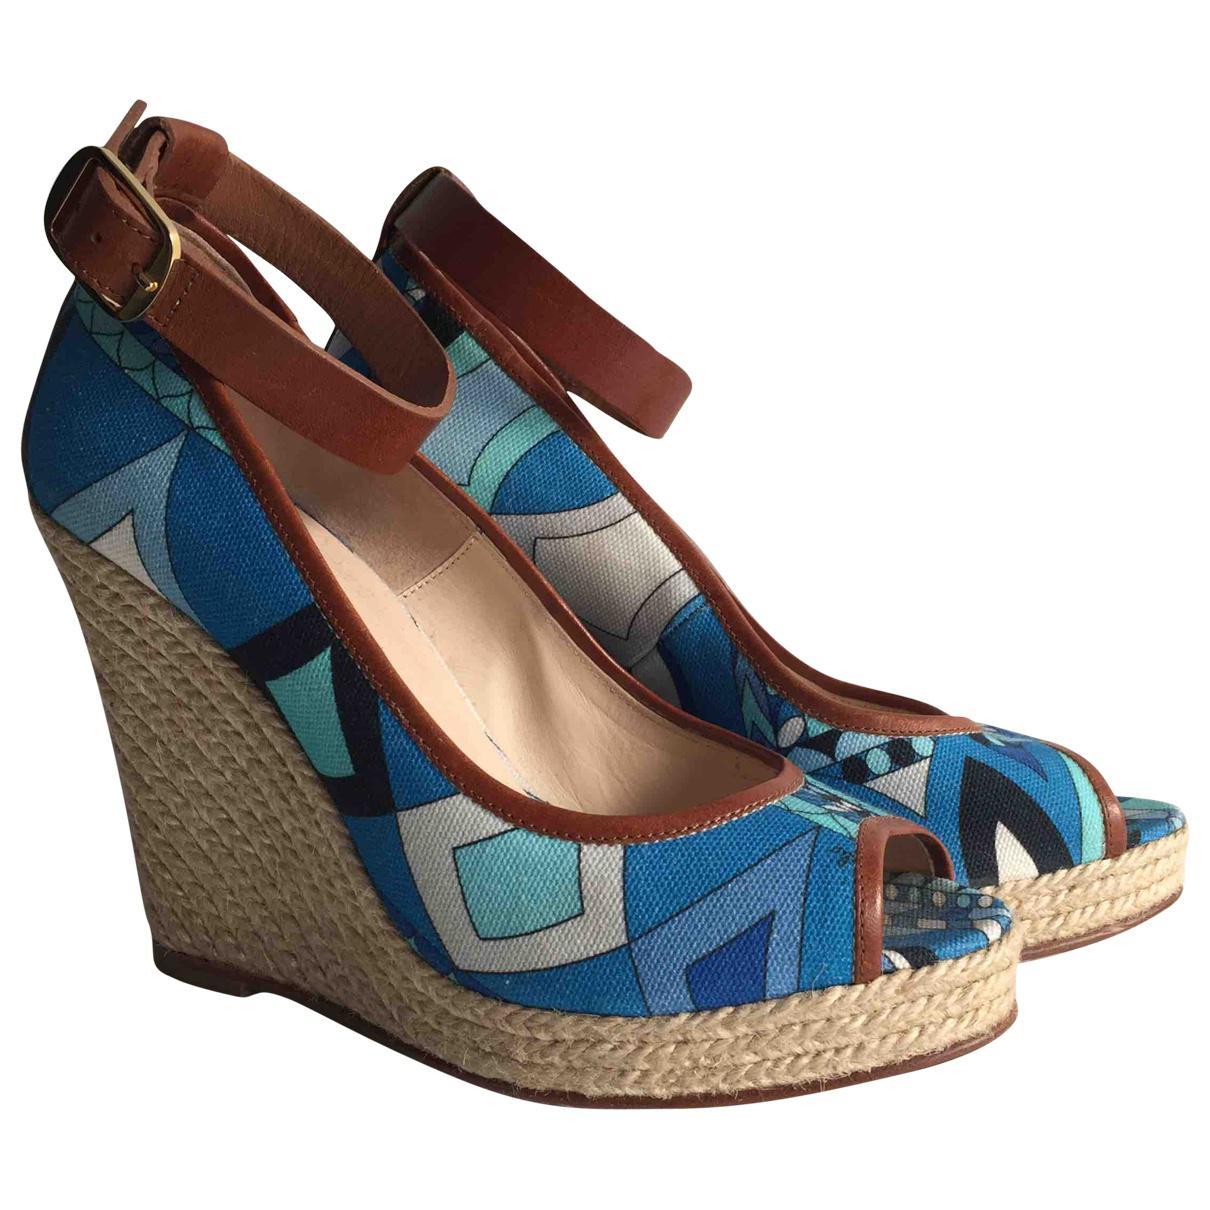 Pre-owned - Cloth sandals Emilio Pucci kjYhizV